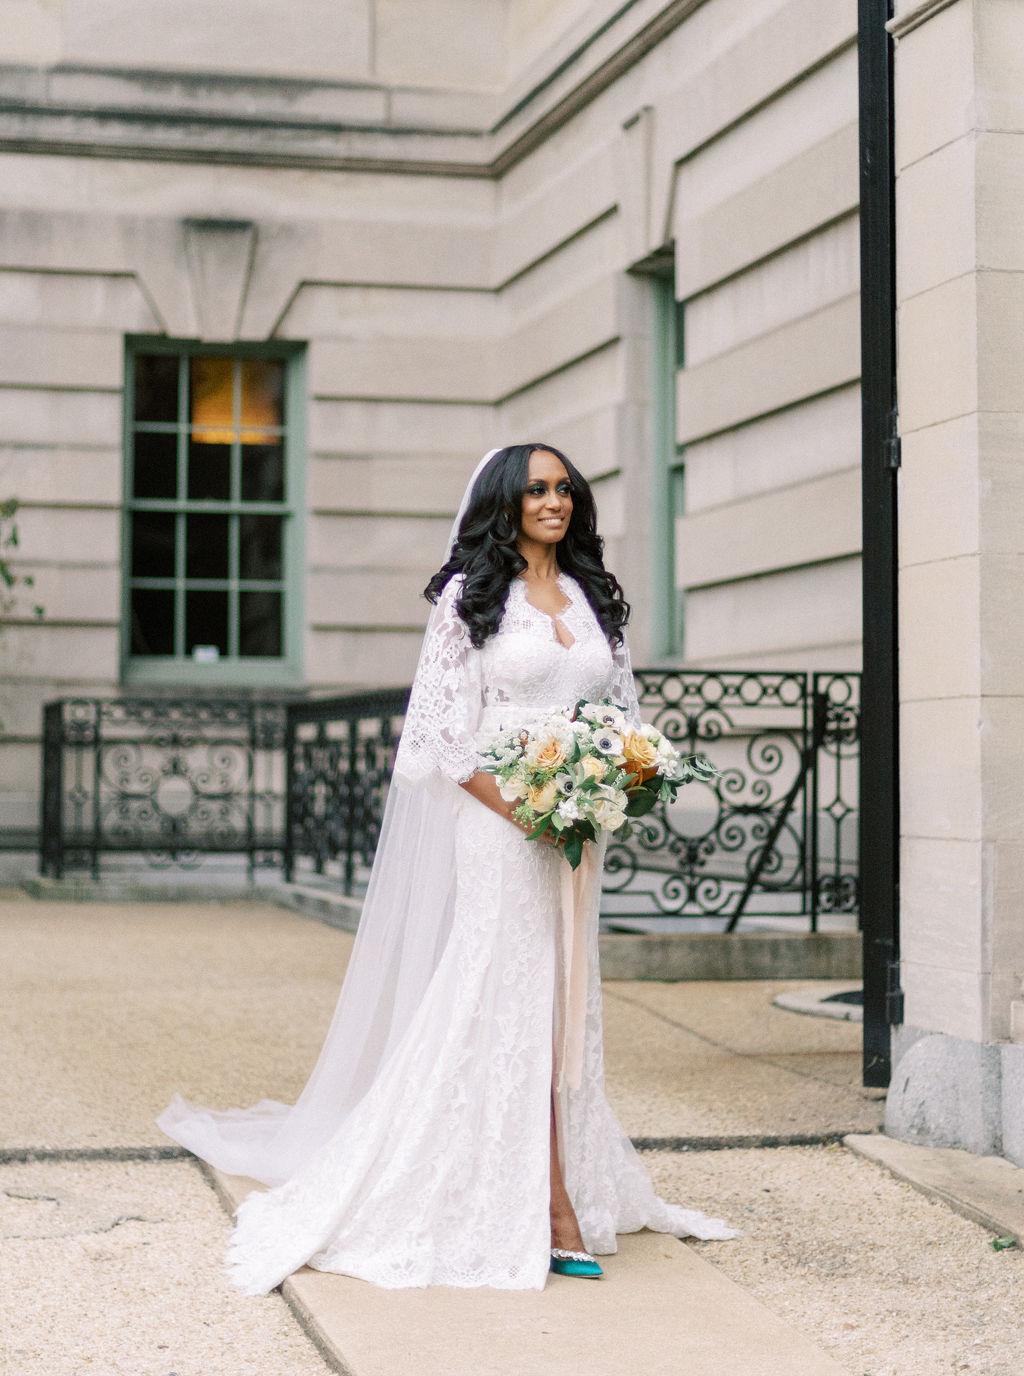 megan henock wedding bride portrait in courtyard